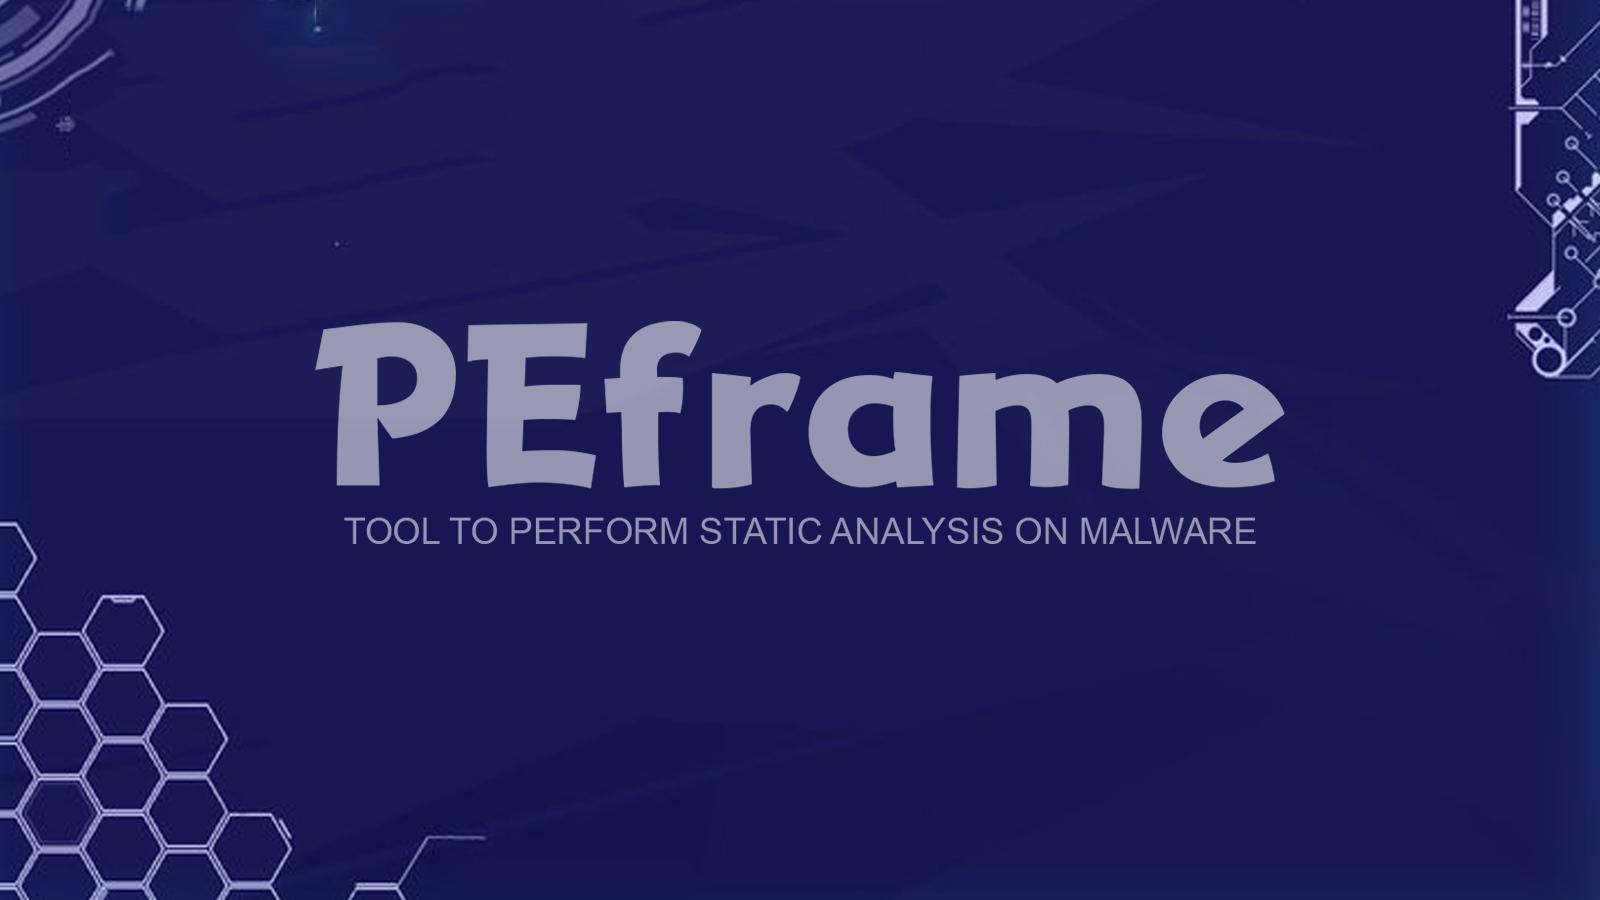 PEframe - Tool To Perform Static Analysis On Malware